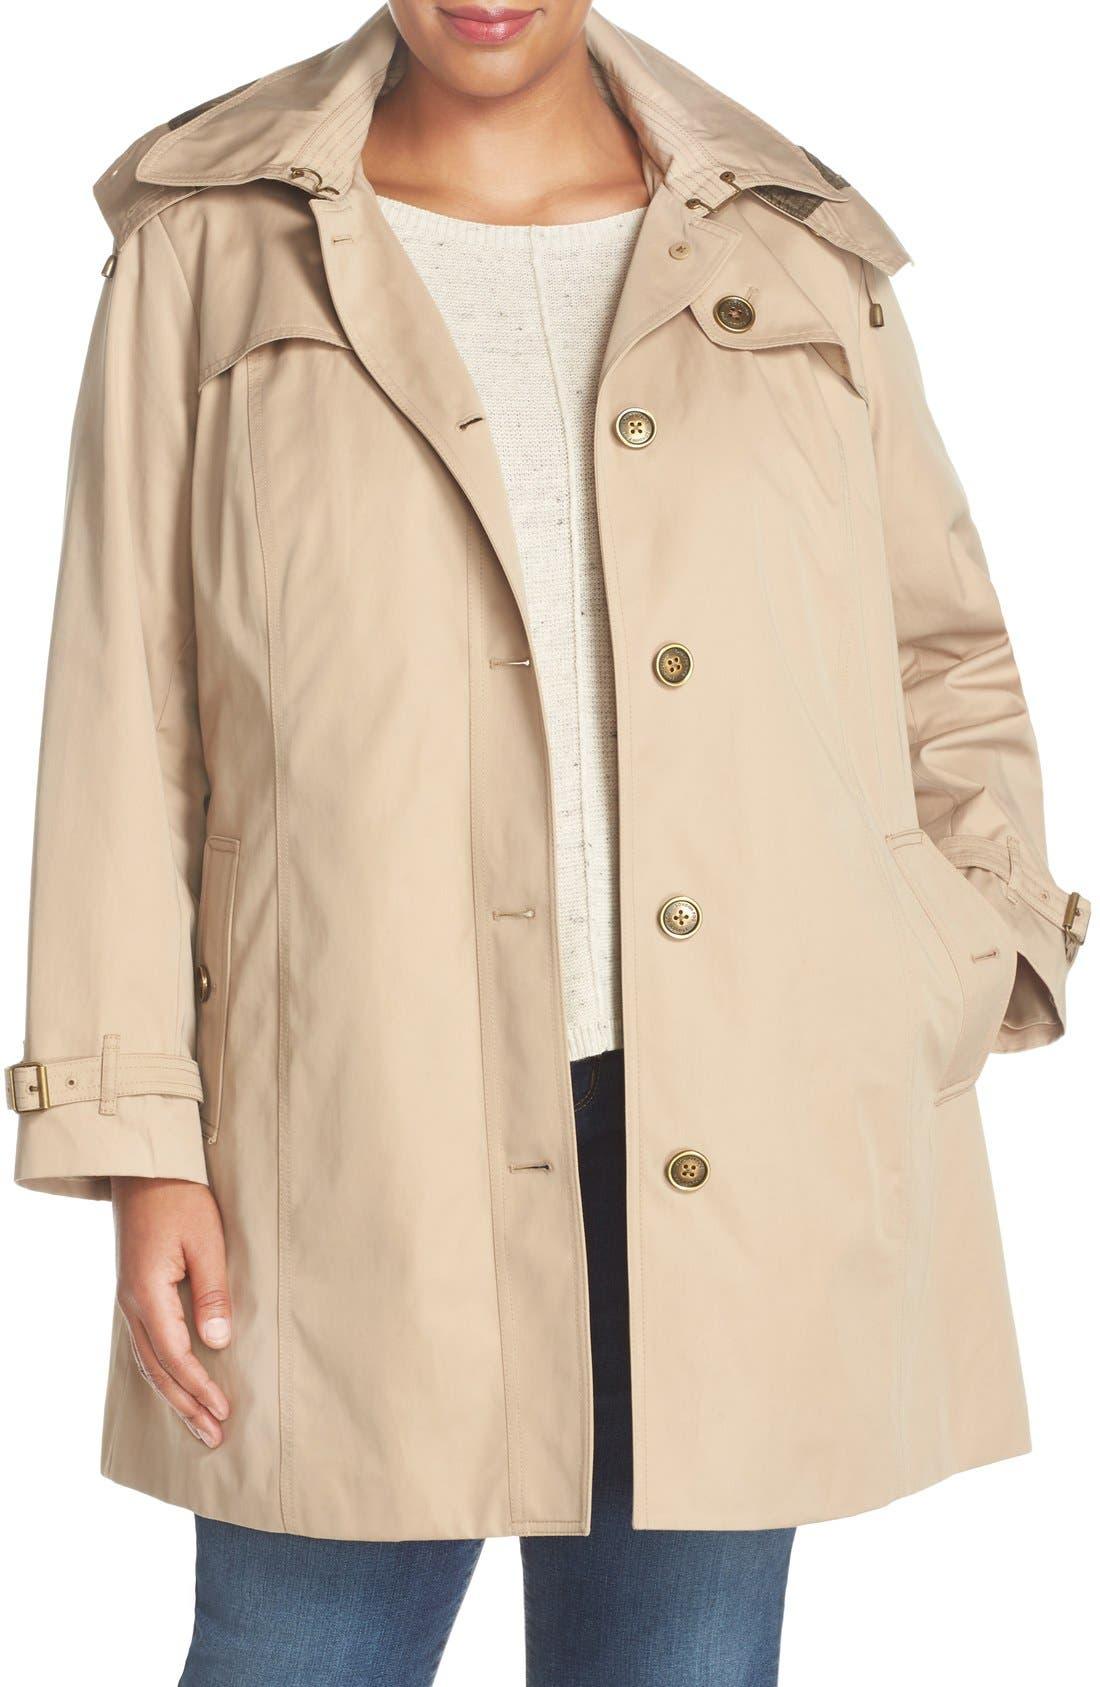 Main Image - London Fog Single Breasted Trench Coat (Plus Size)